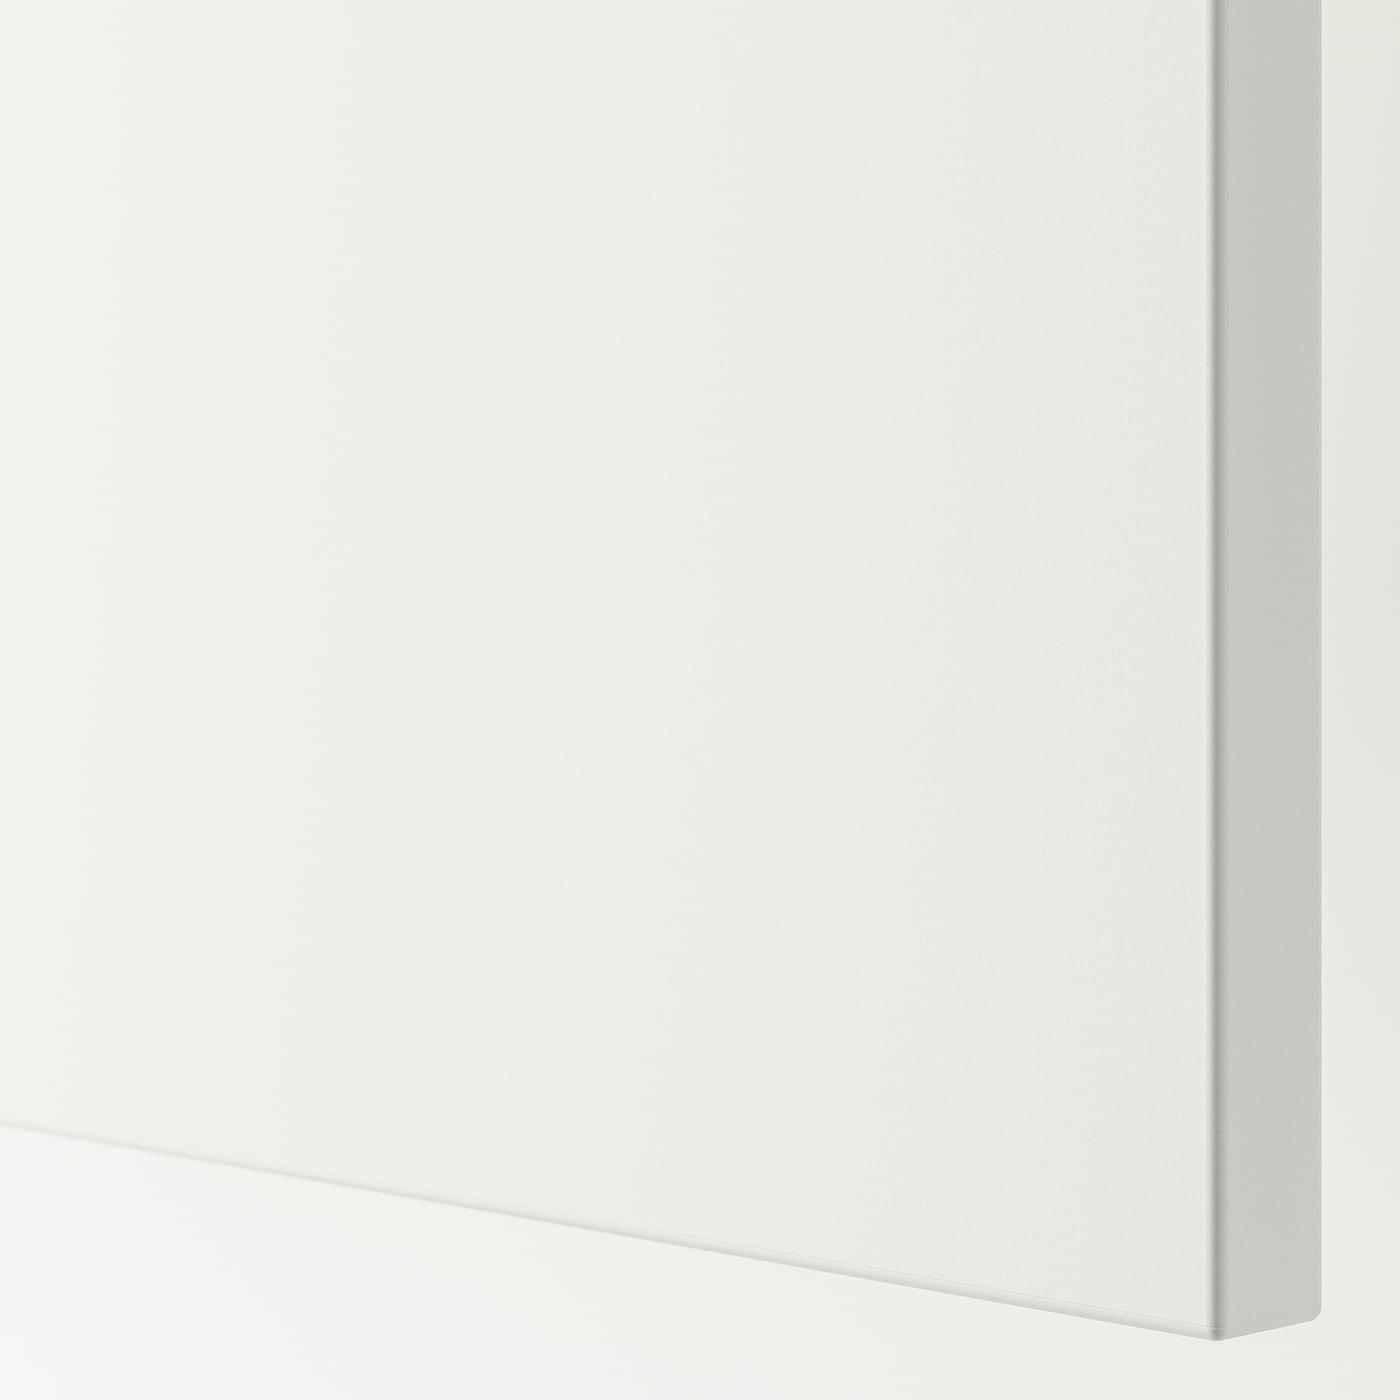 FONNES باب بمفصلات, أبيض, 60x60 سم